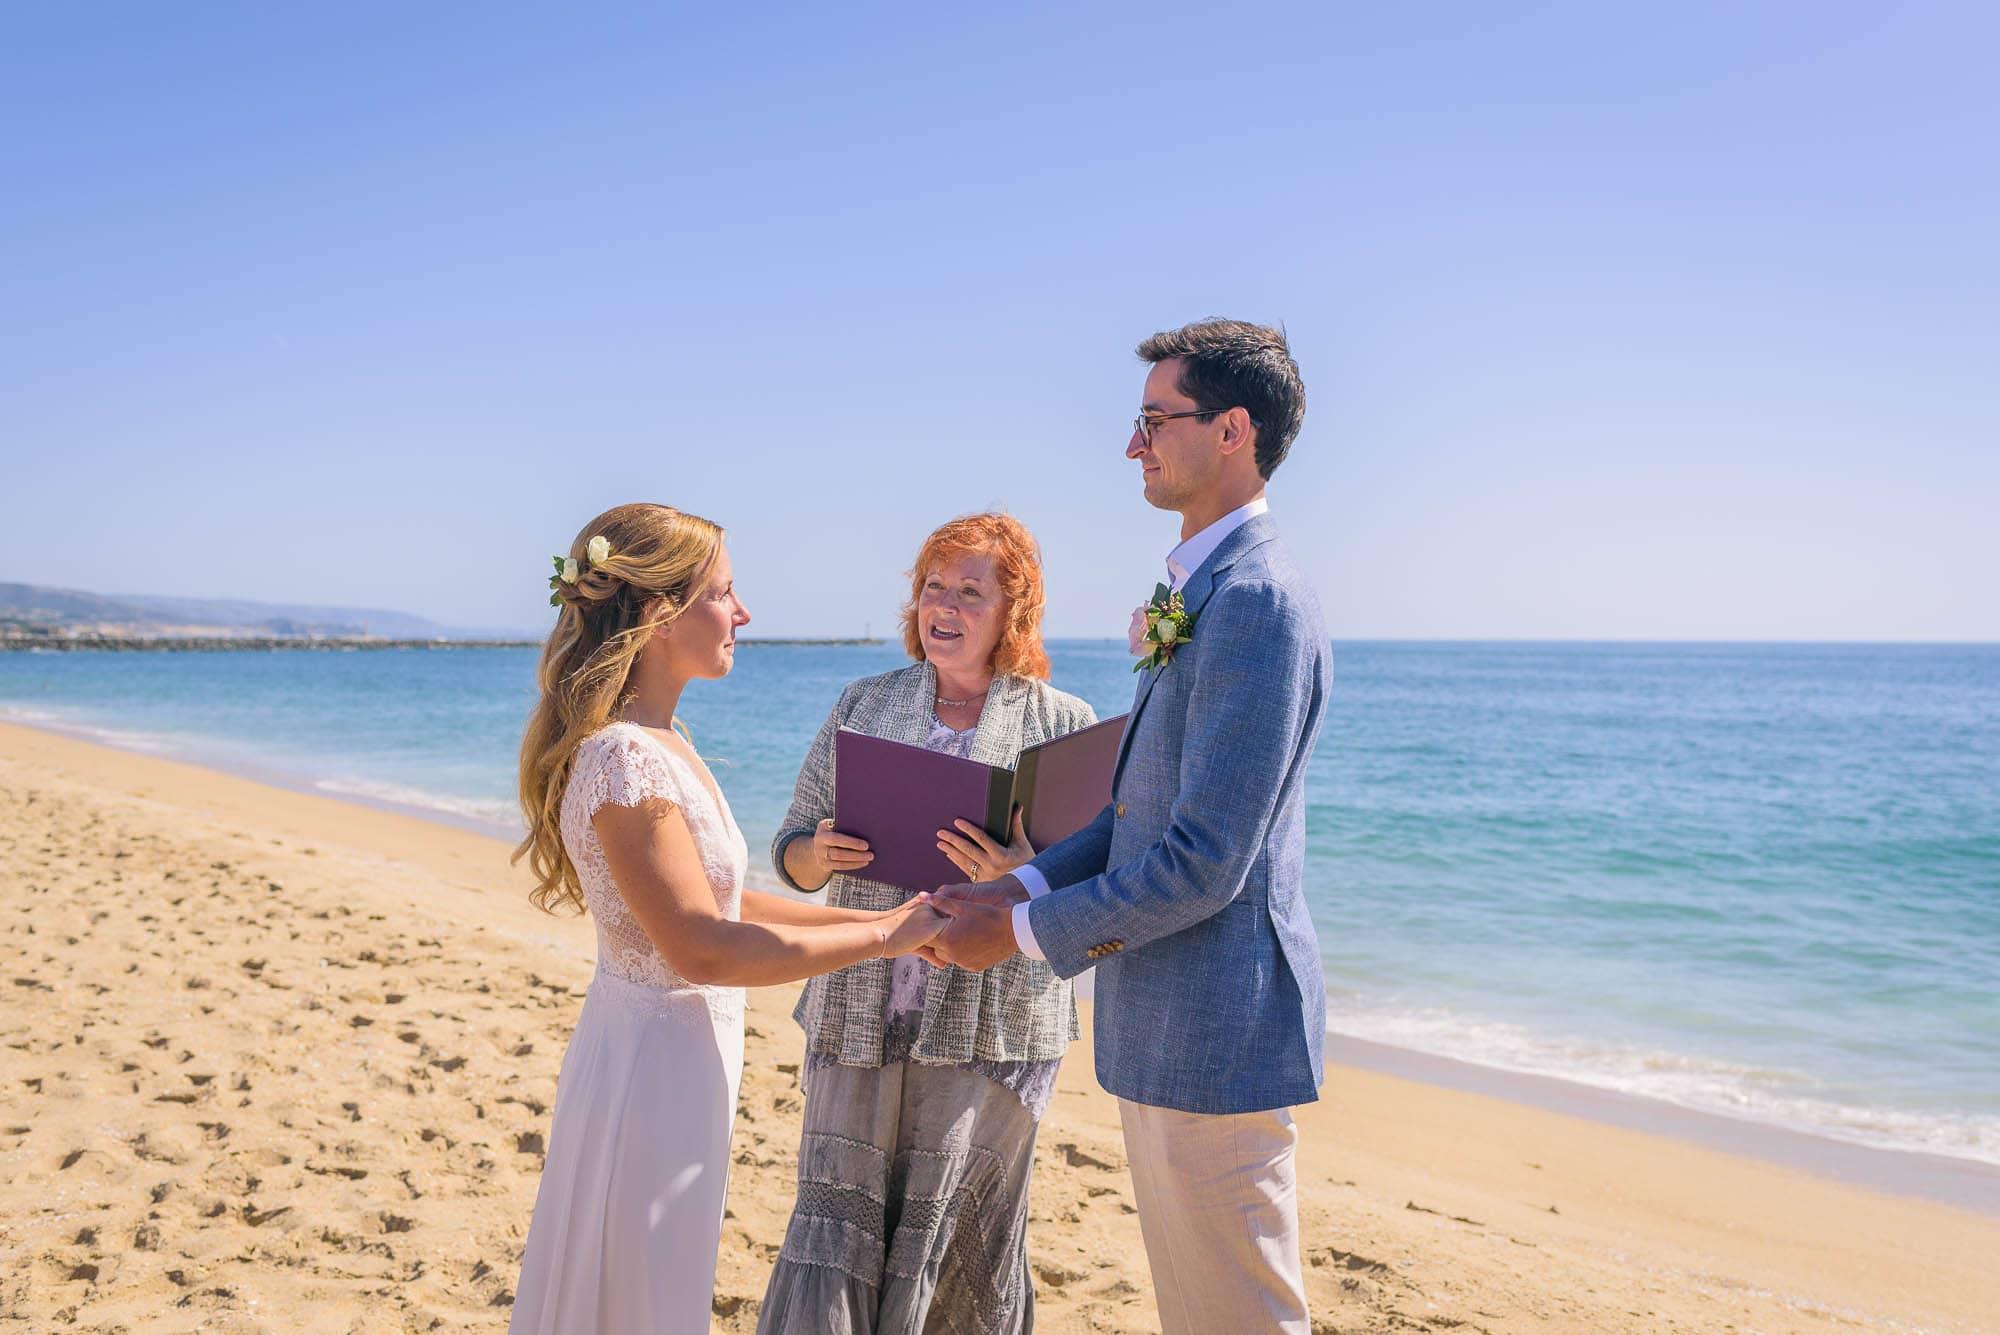 020_Alan_and_Heidi_Wedding_Verena_Andreas